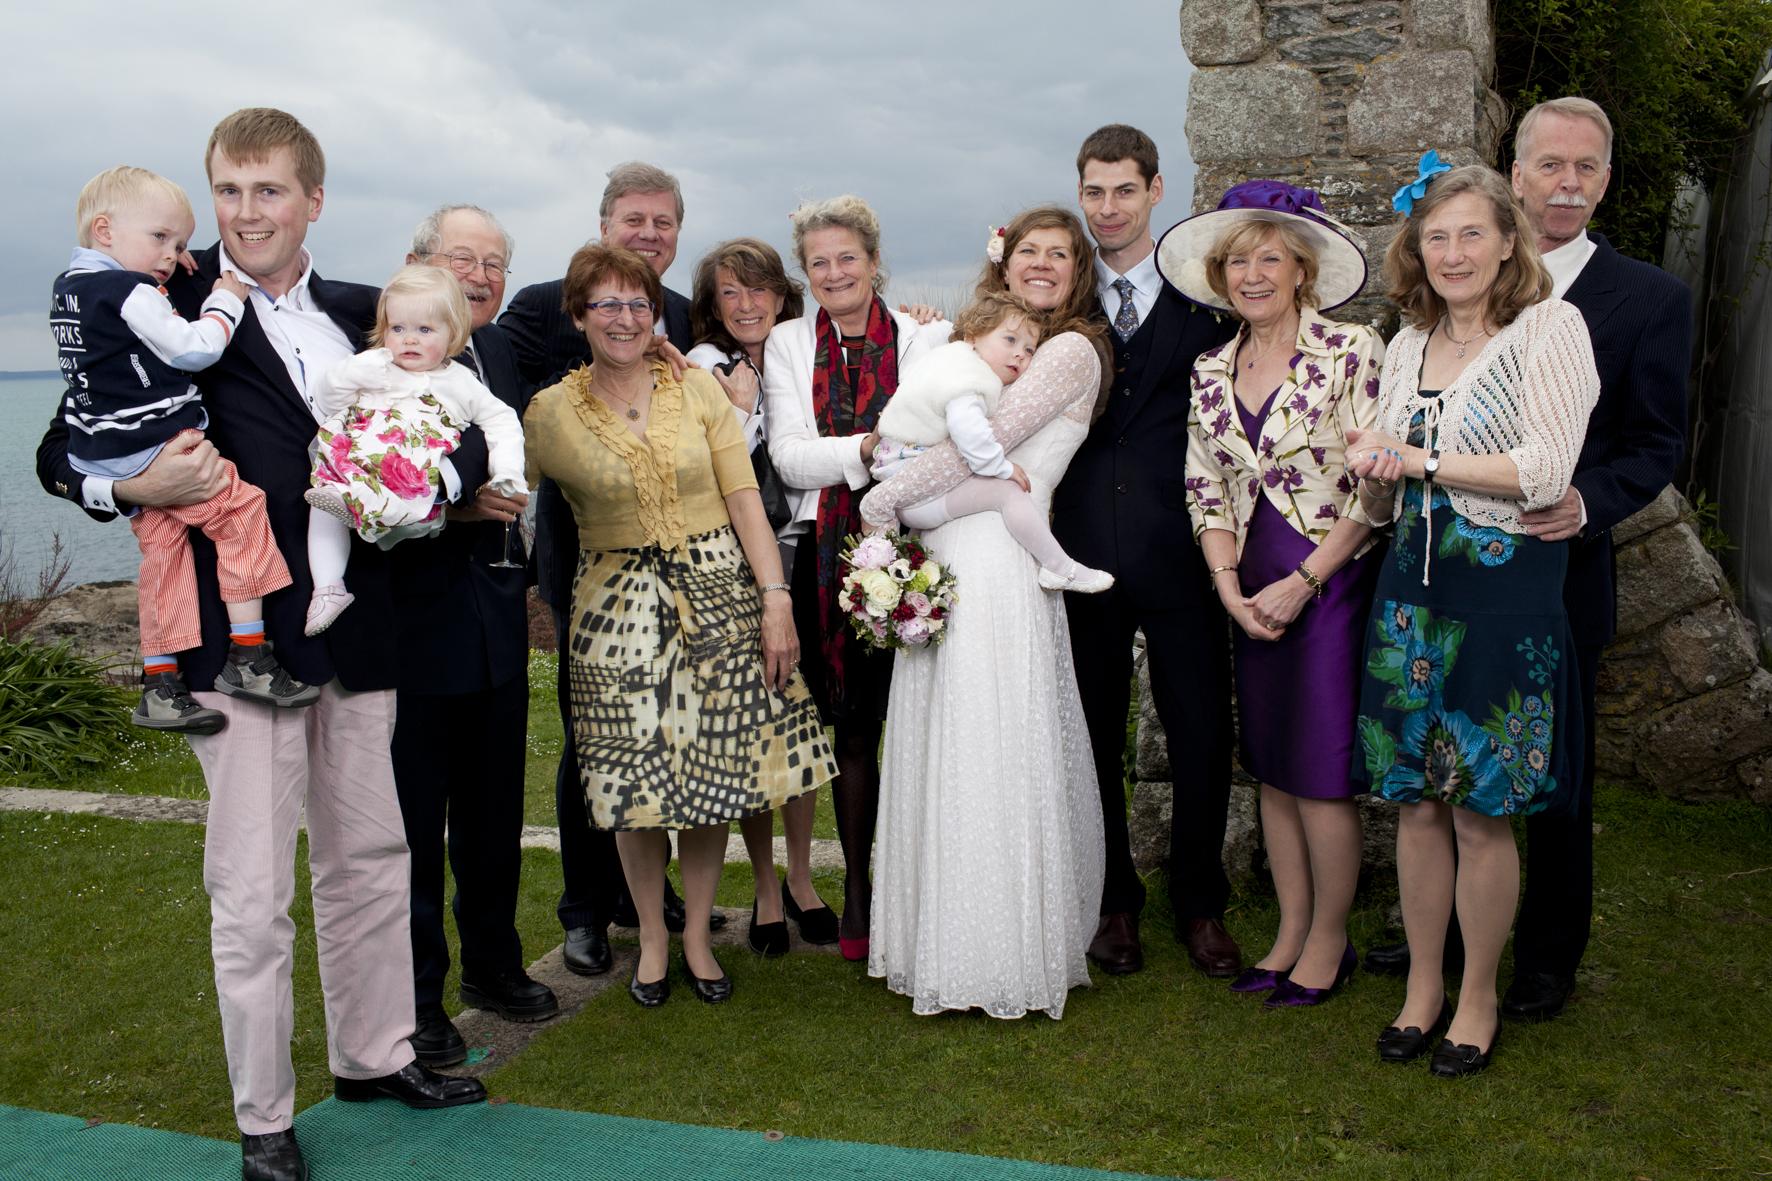 Wedding example_M&P__MG_3744_Claudia Leisinger.jpg